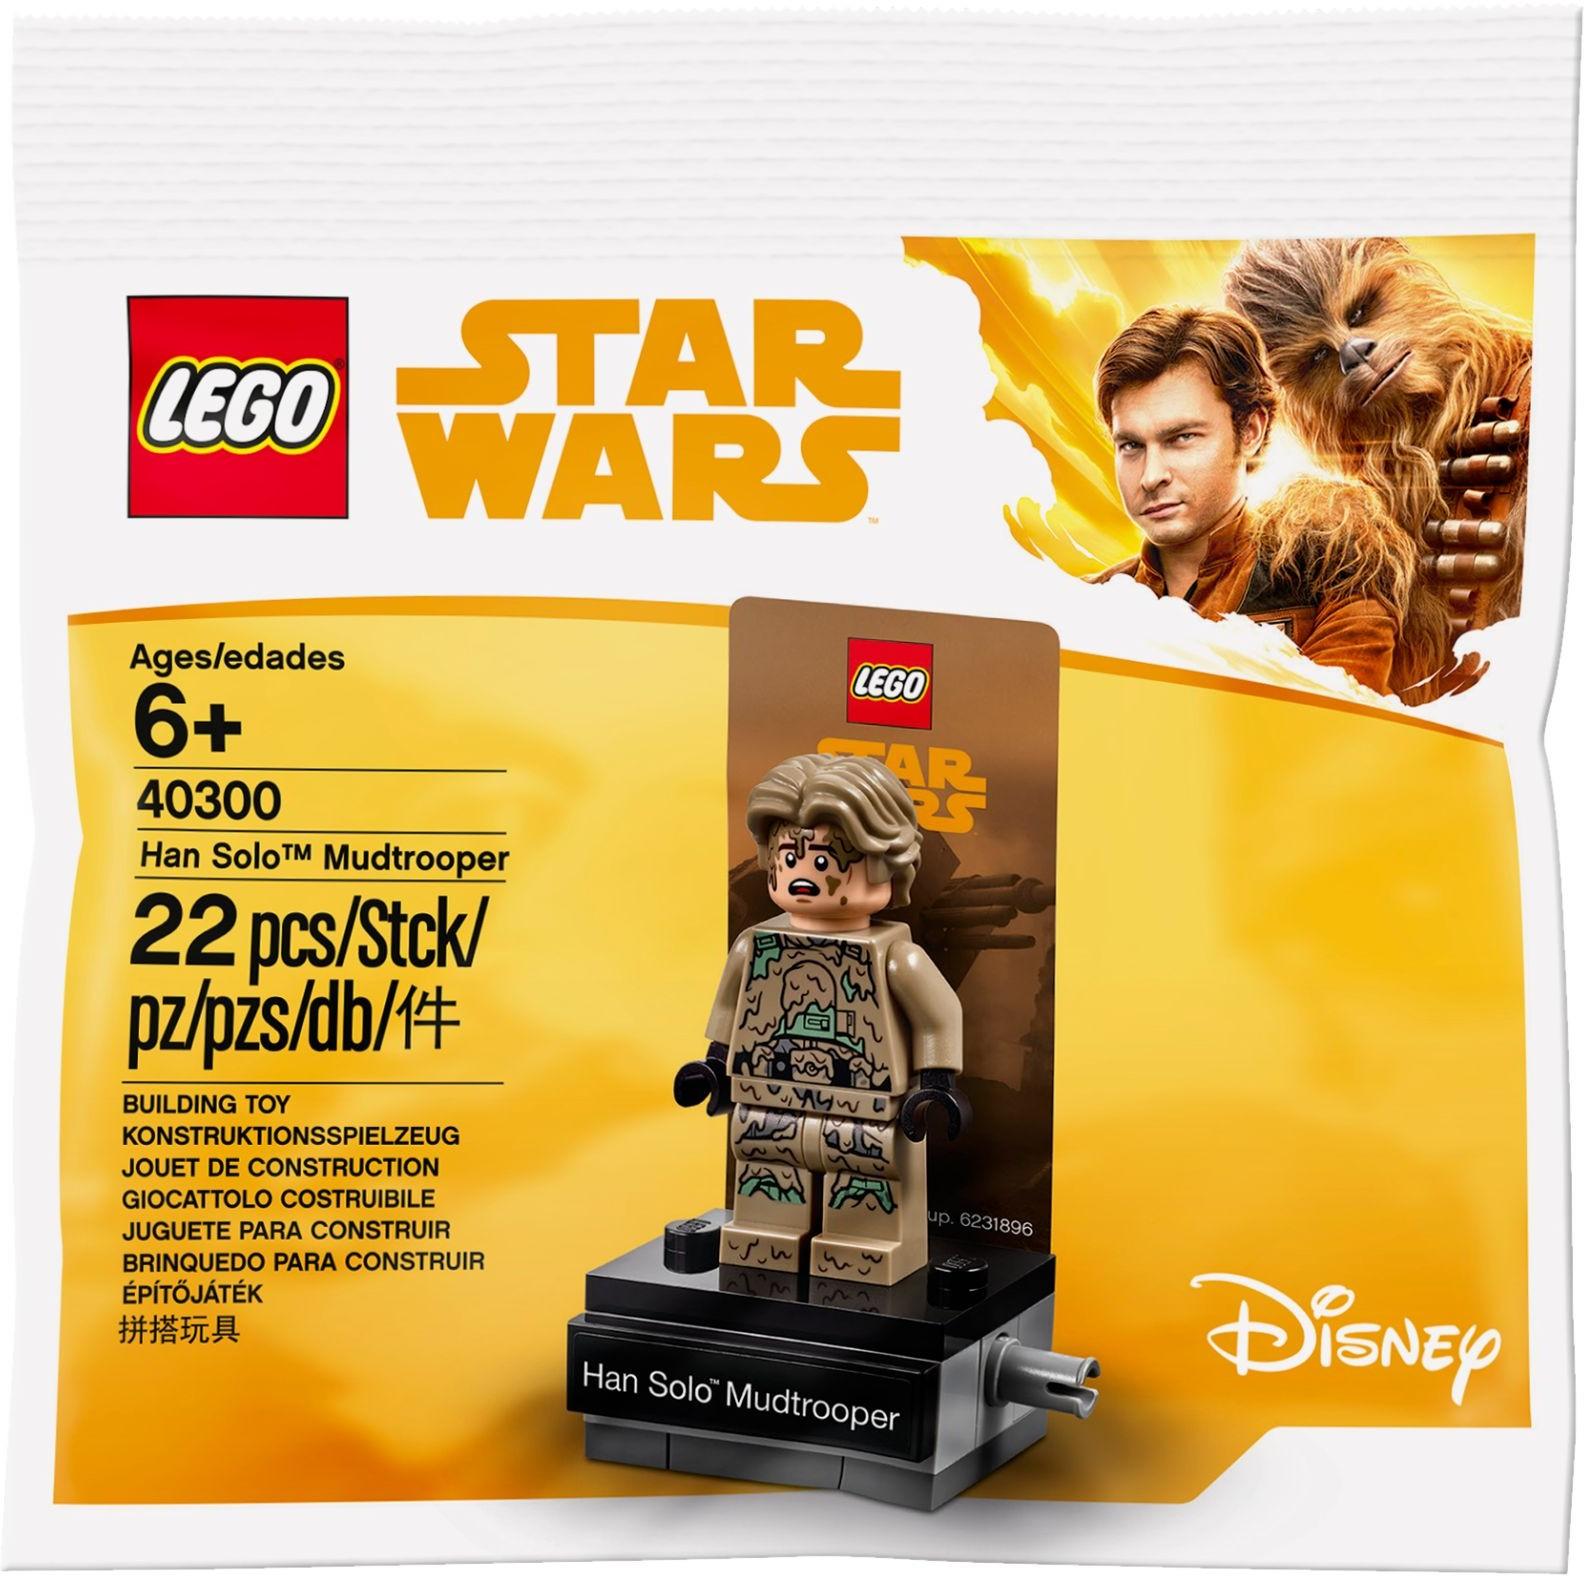 Han Solo Mudtrooper -